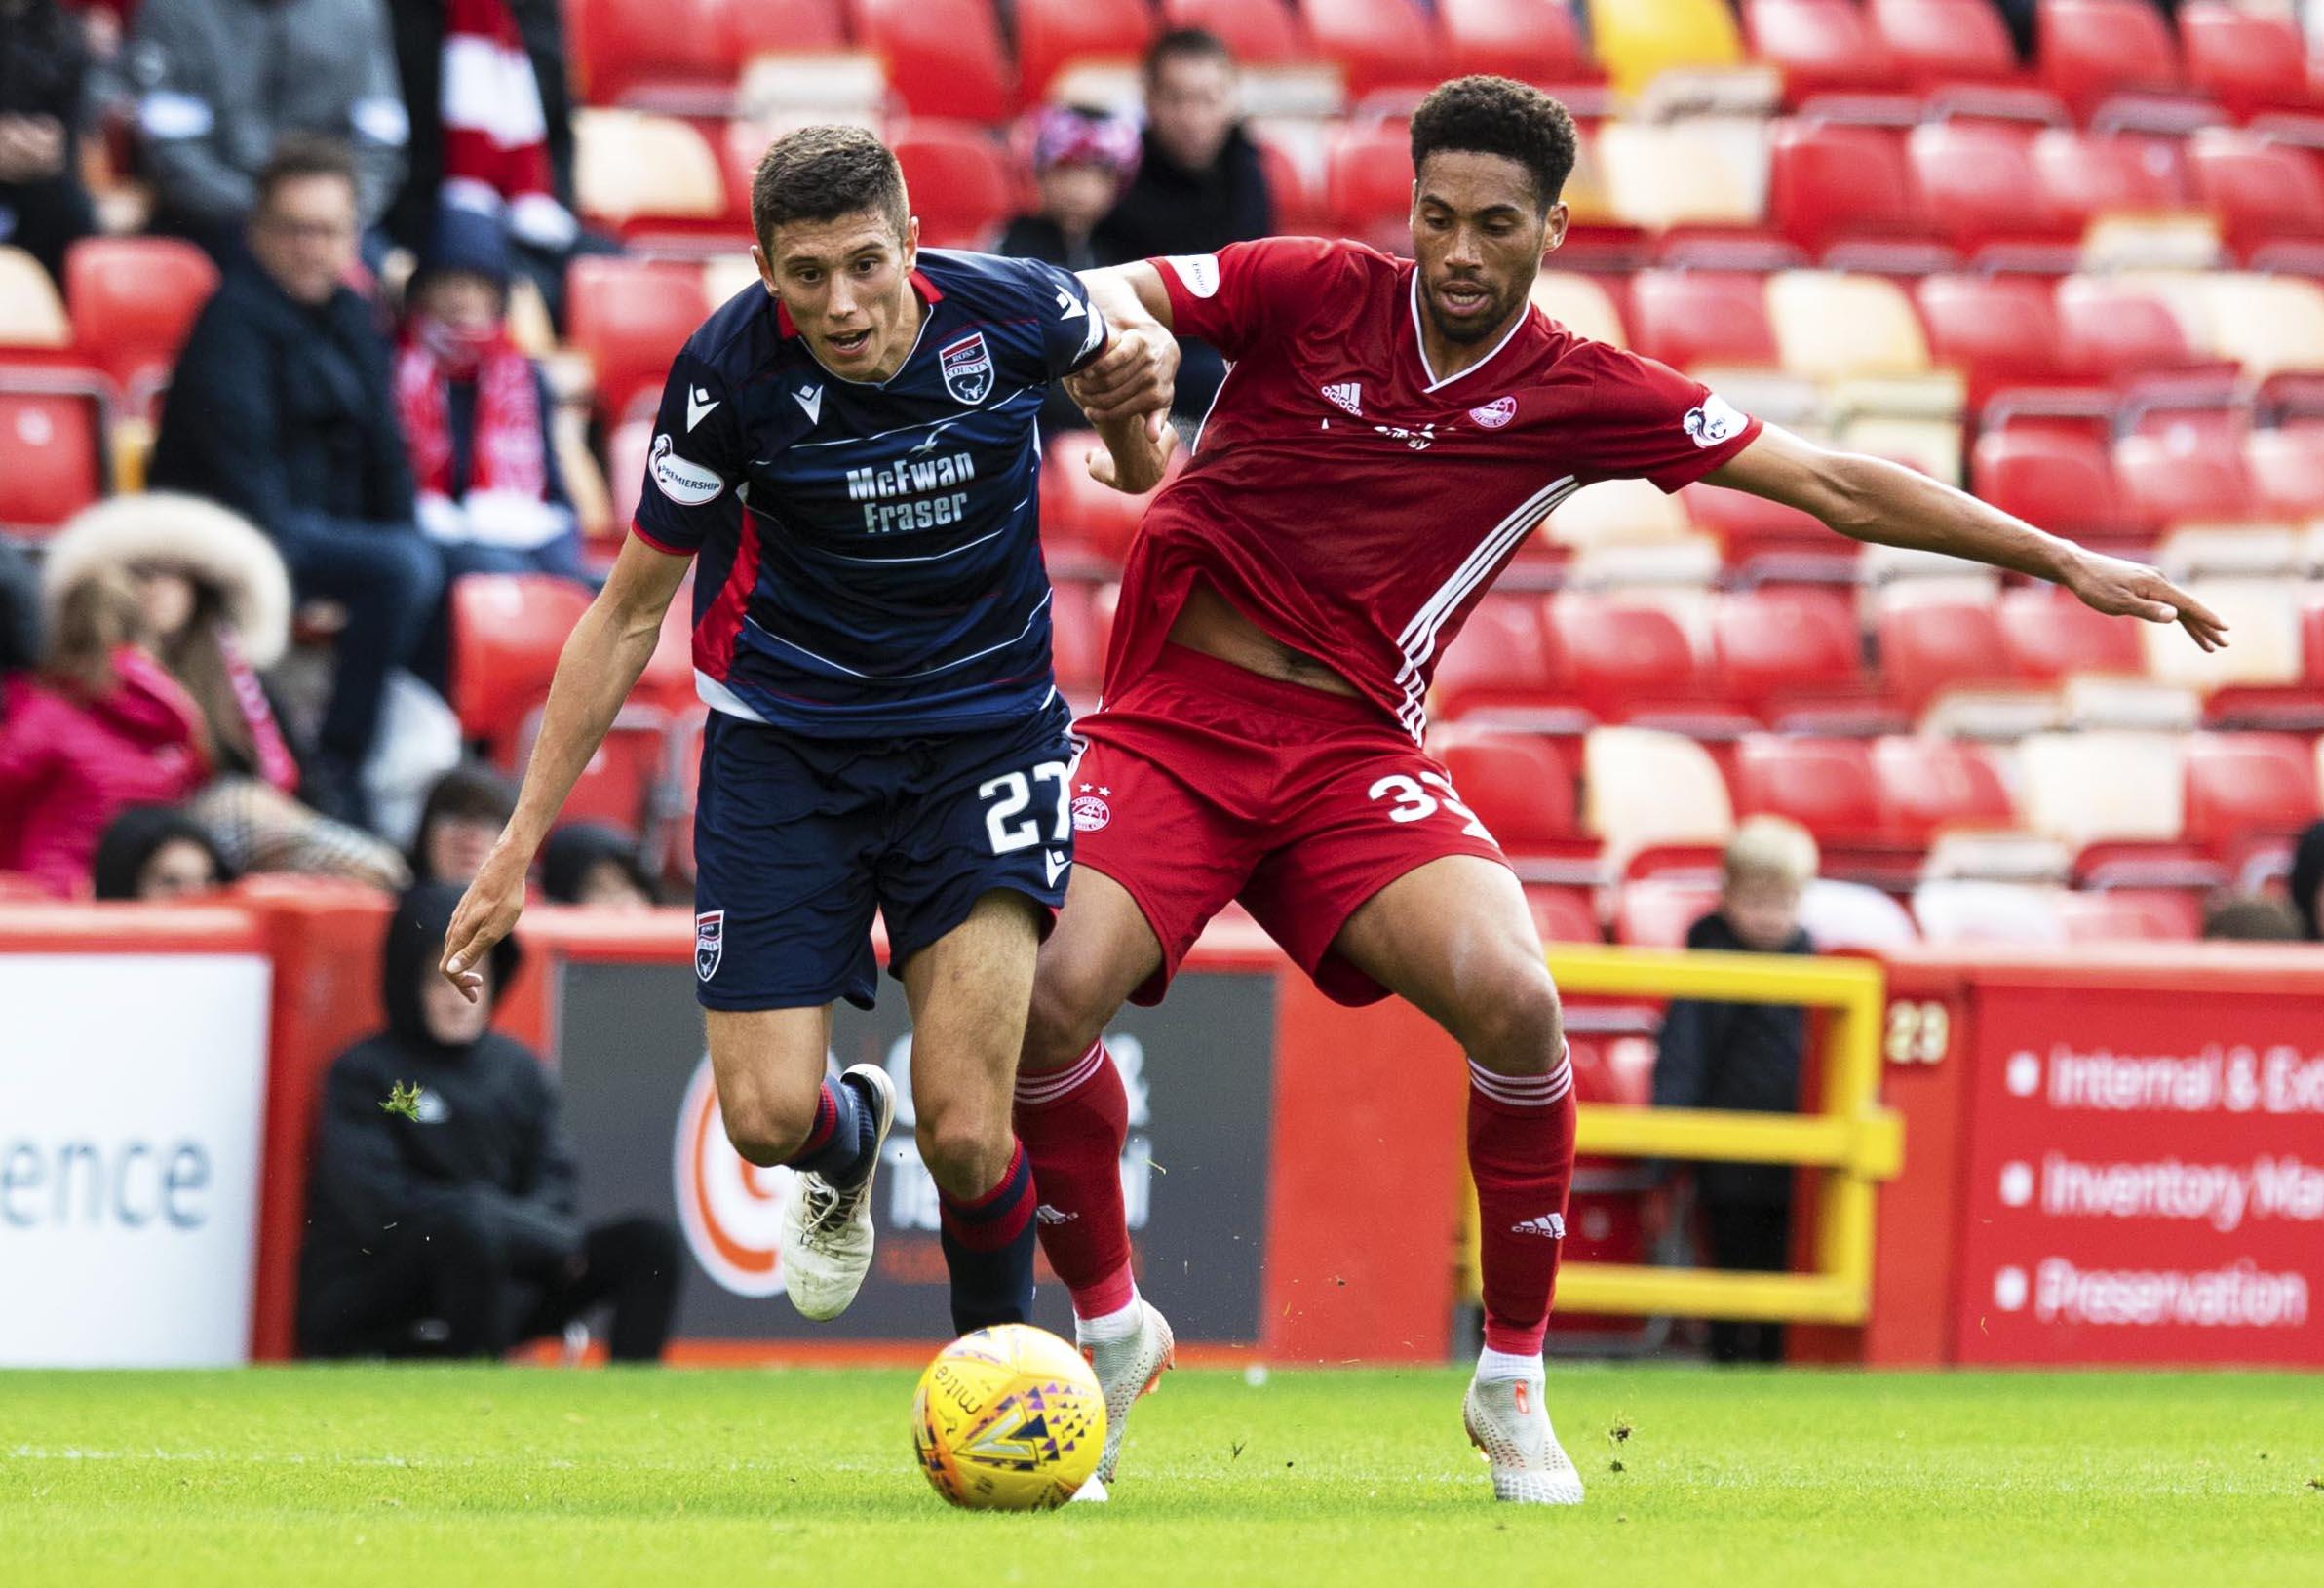 Ross County striker Ross Stewart in action against Aberdeen.